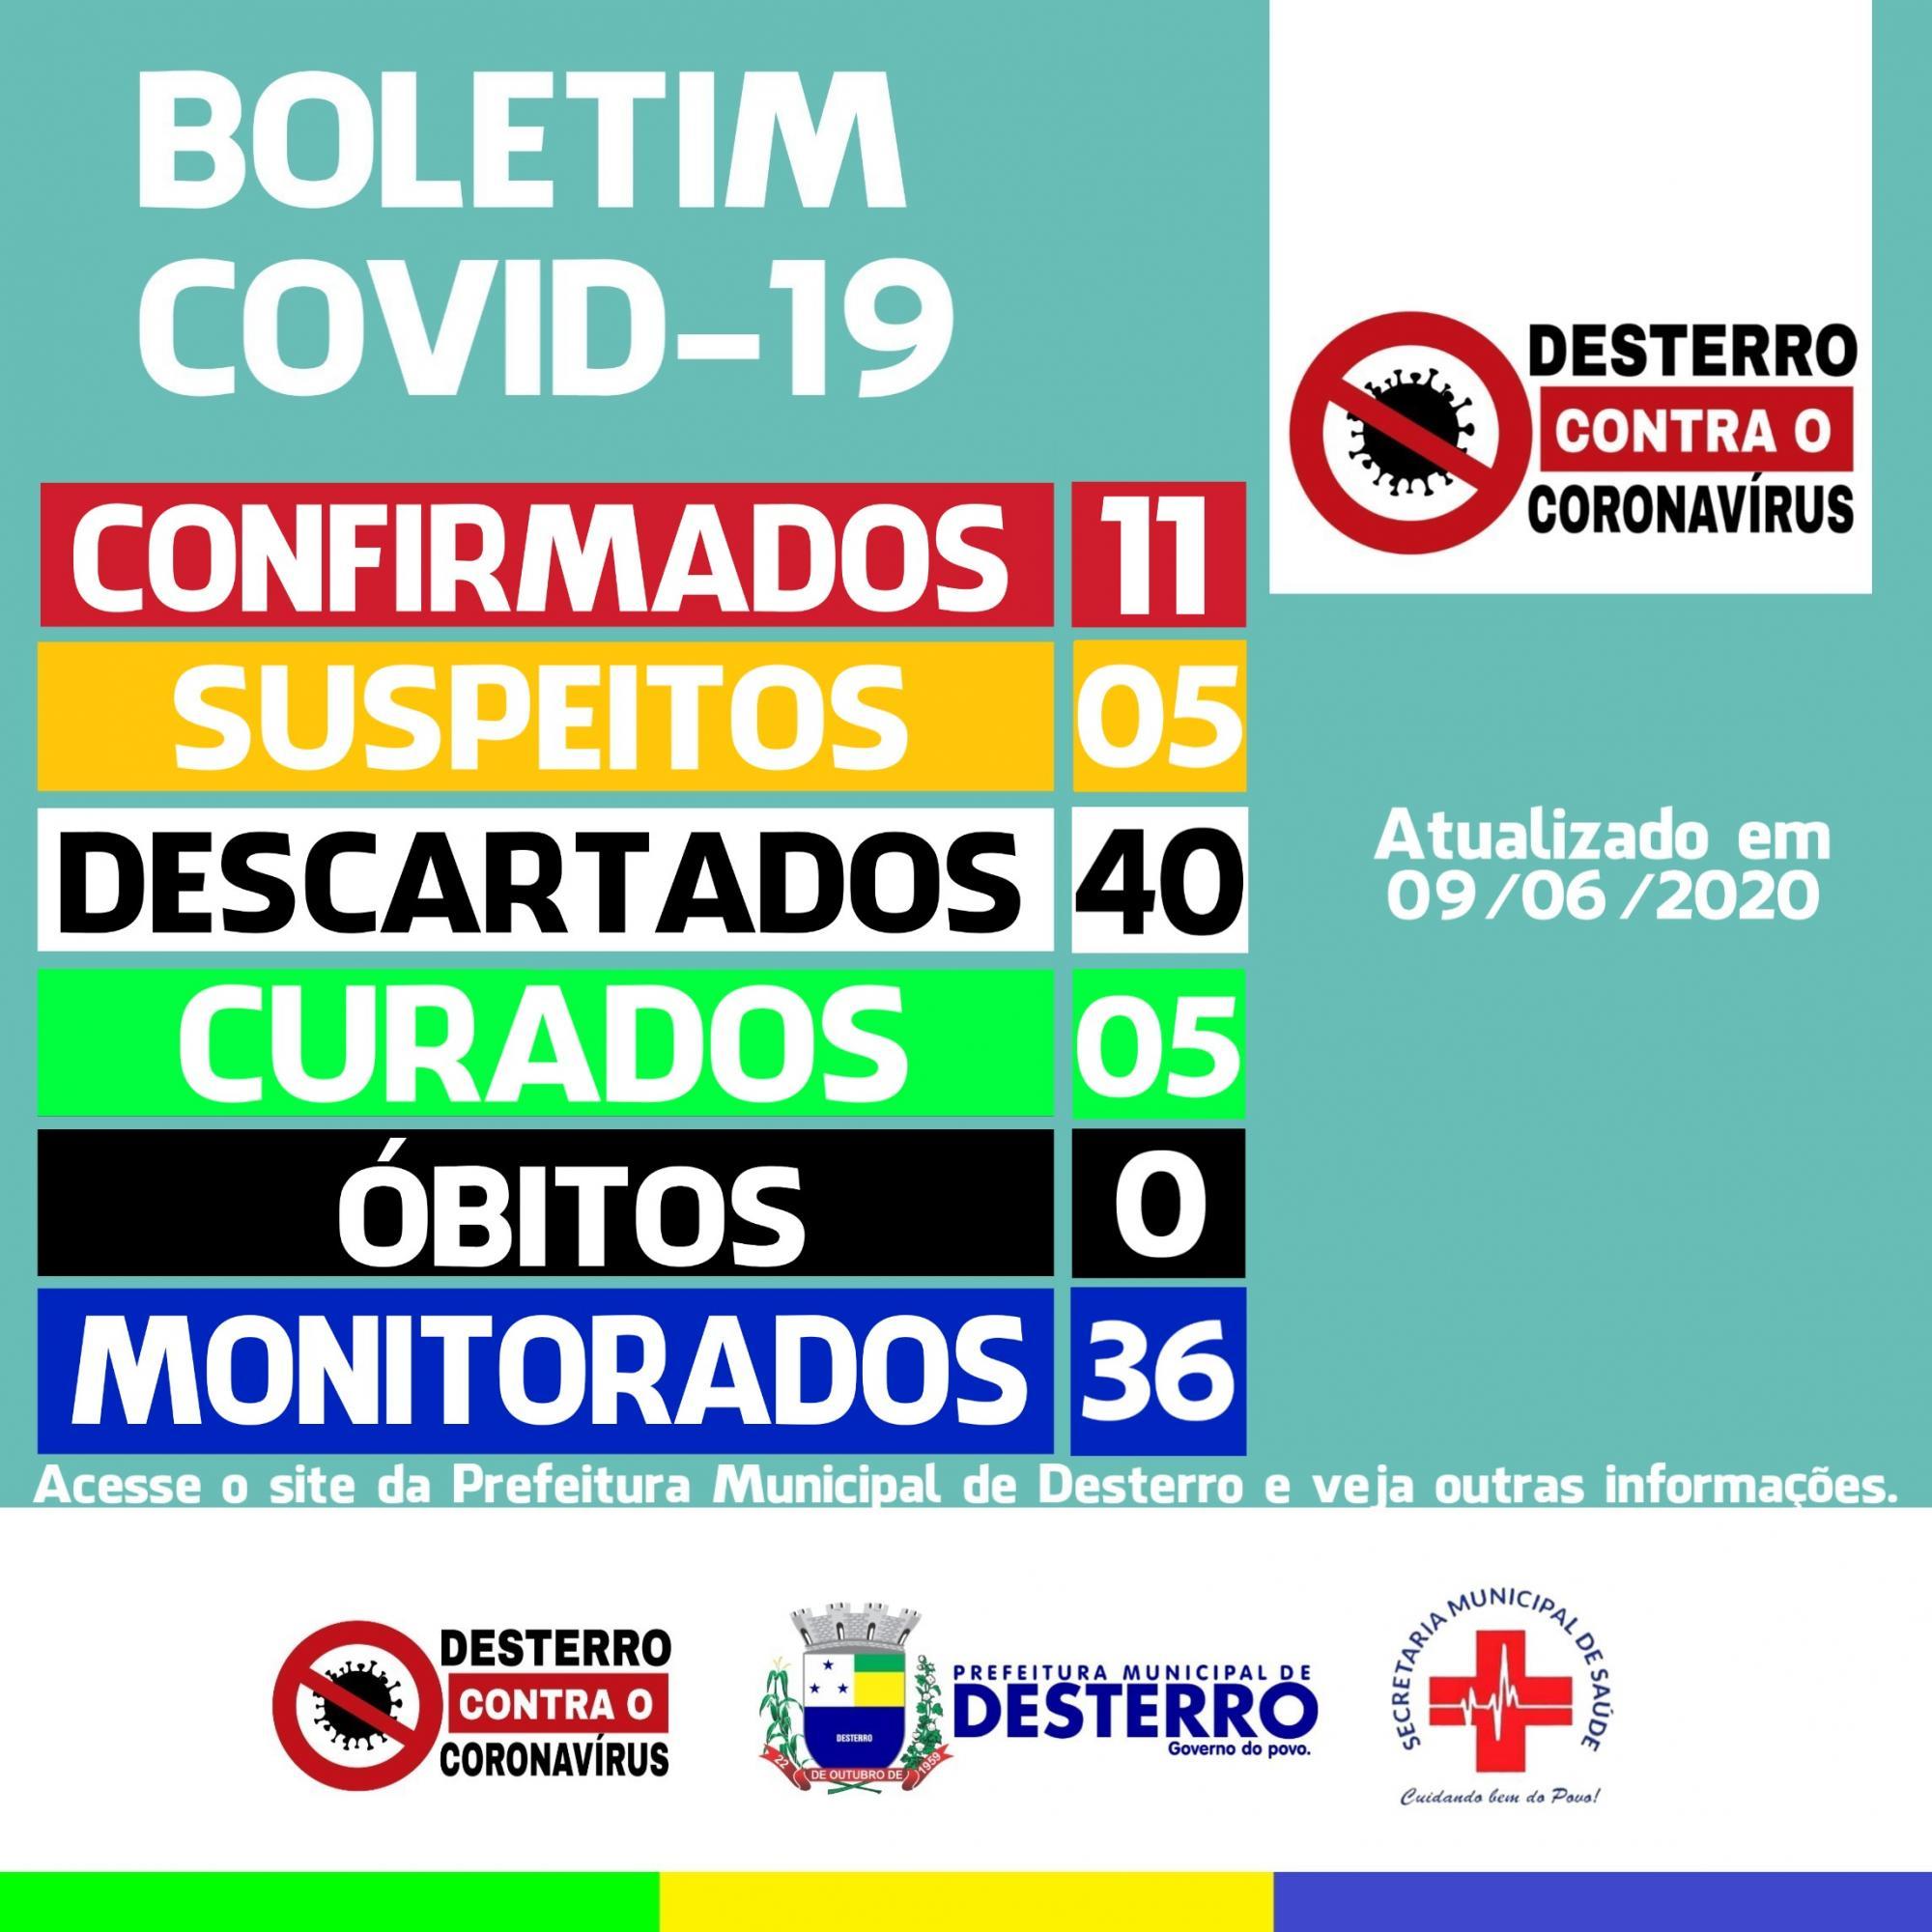 Boletim Covid-19 (09/06/2020)